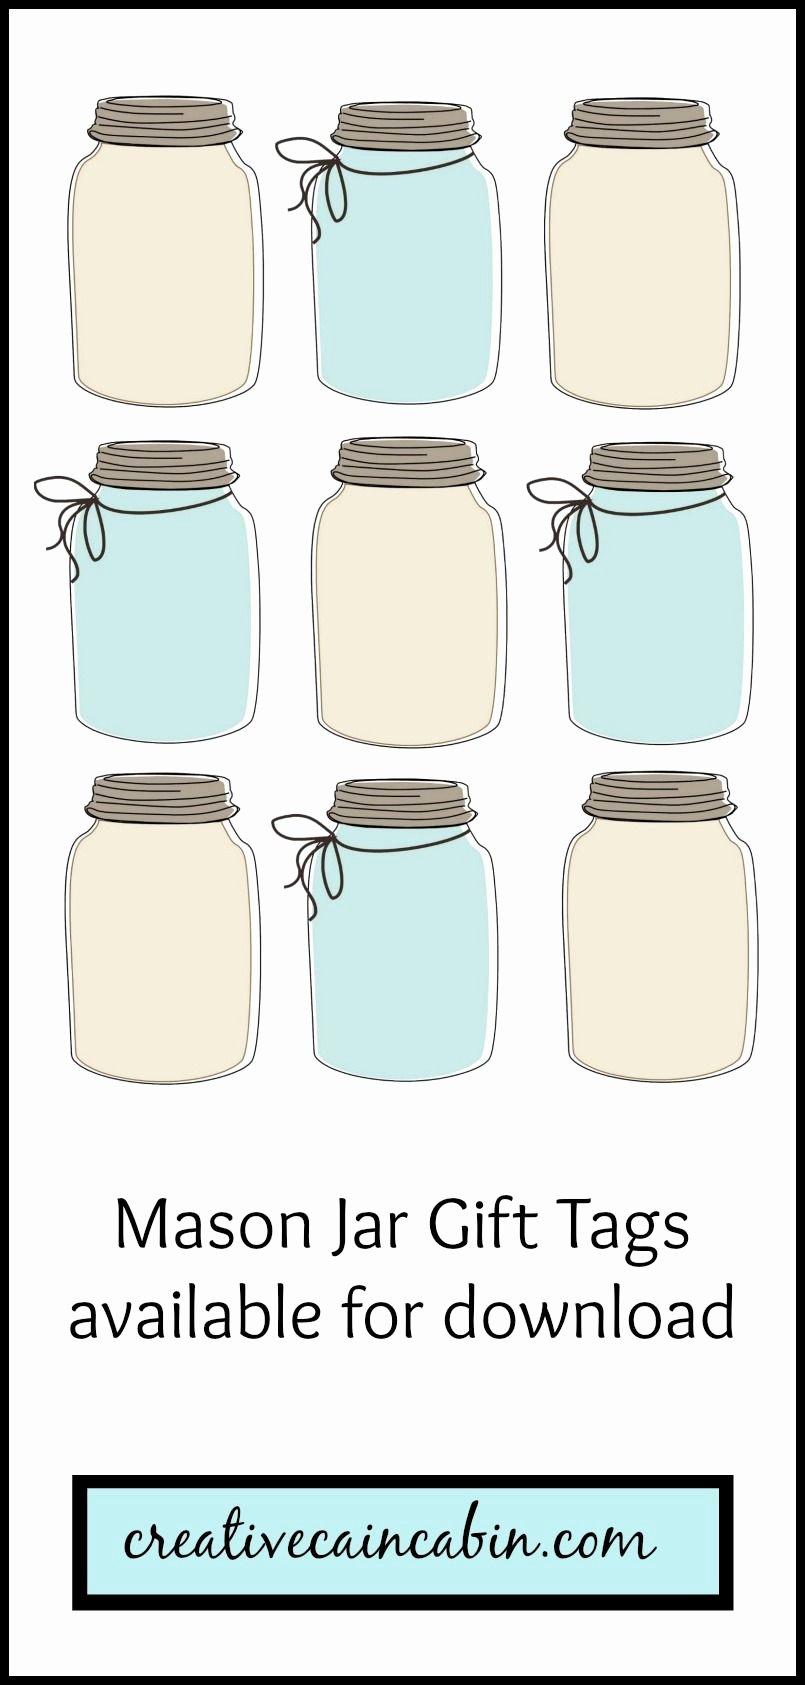 Printable Mason Jar Template Beautiful Hot Chocolate Mix Recipe